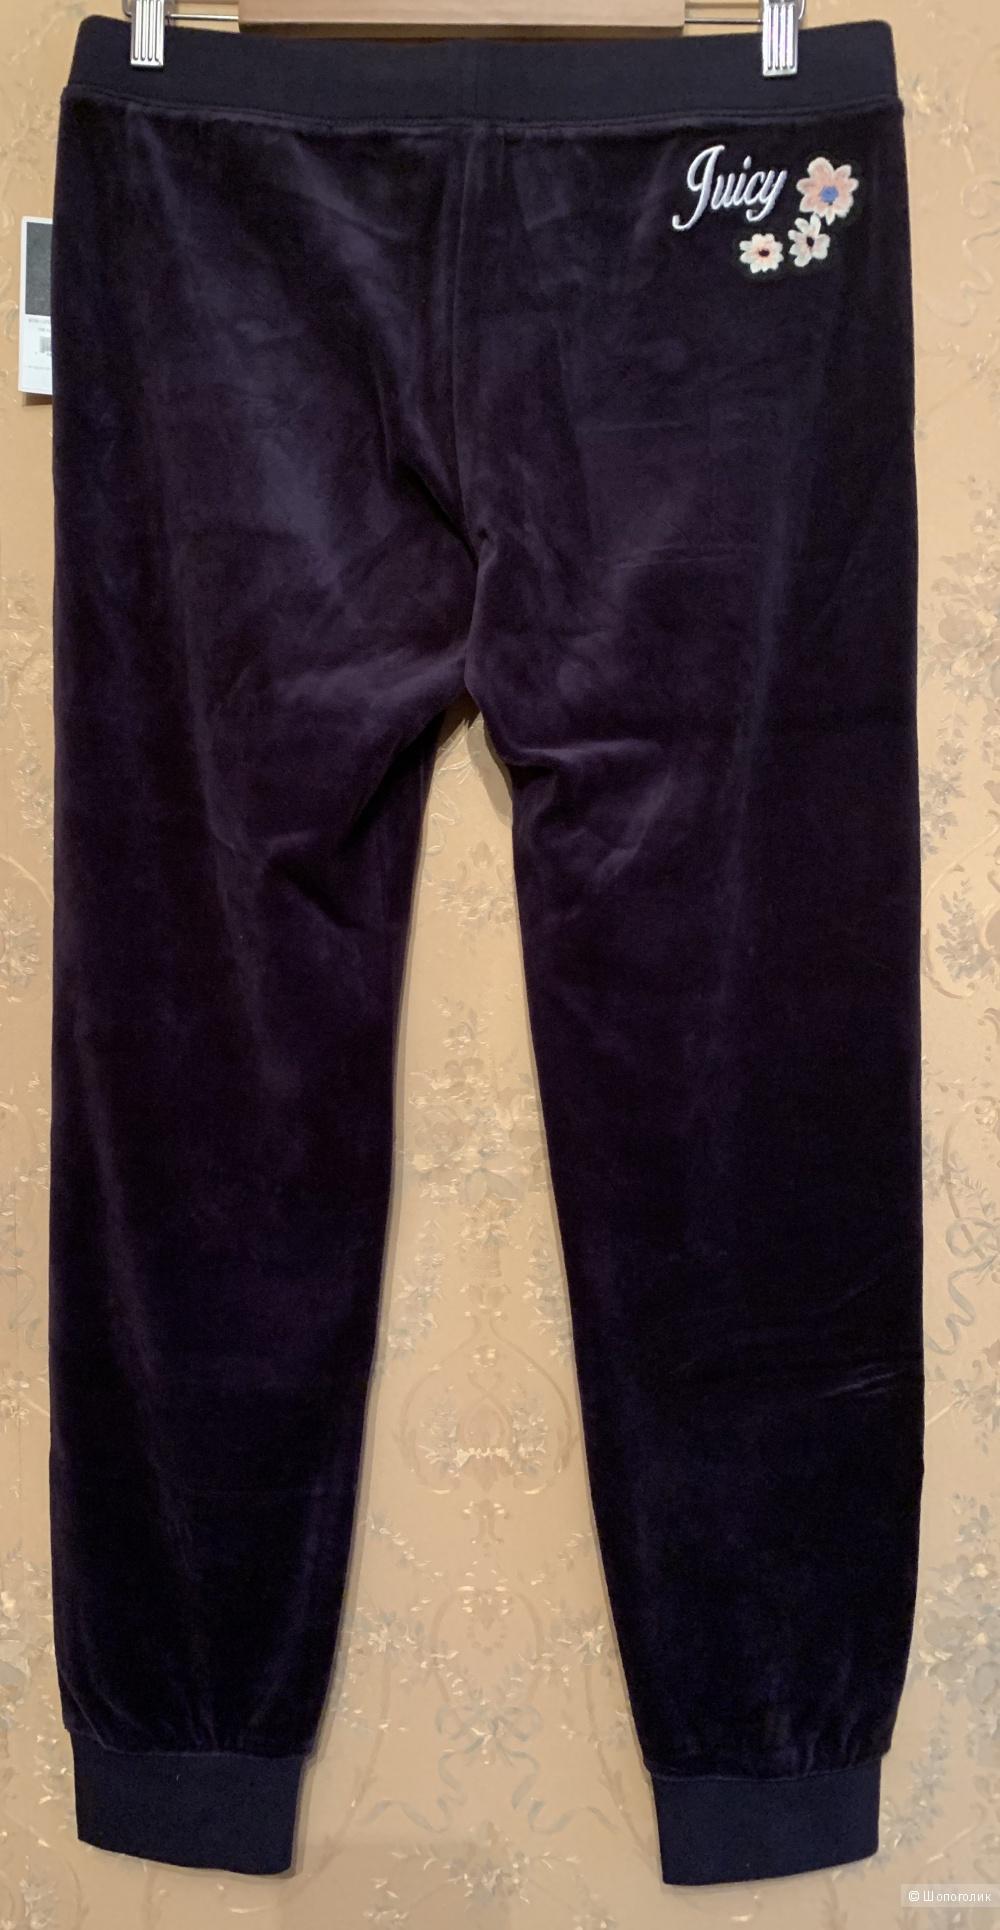 JUICY COUTURE велюровые брюки-джоггеры, размер М